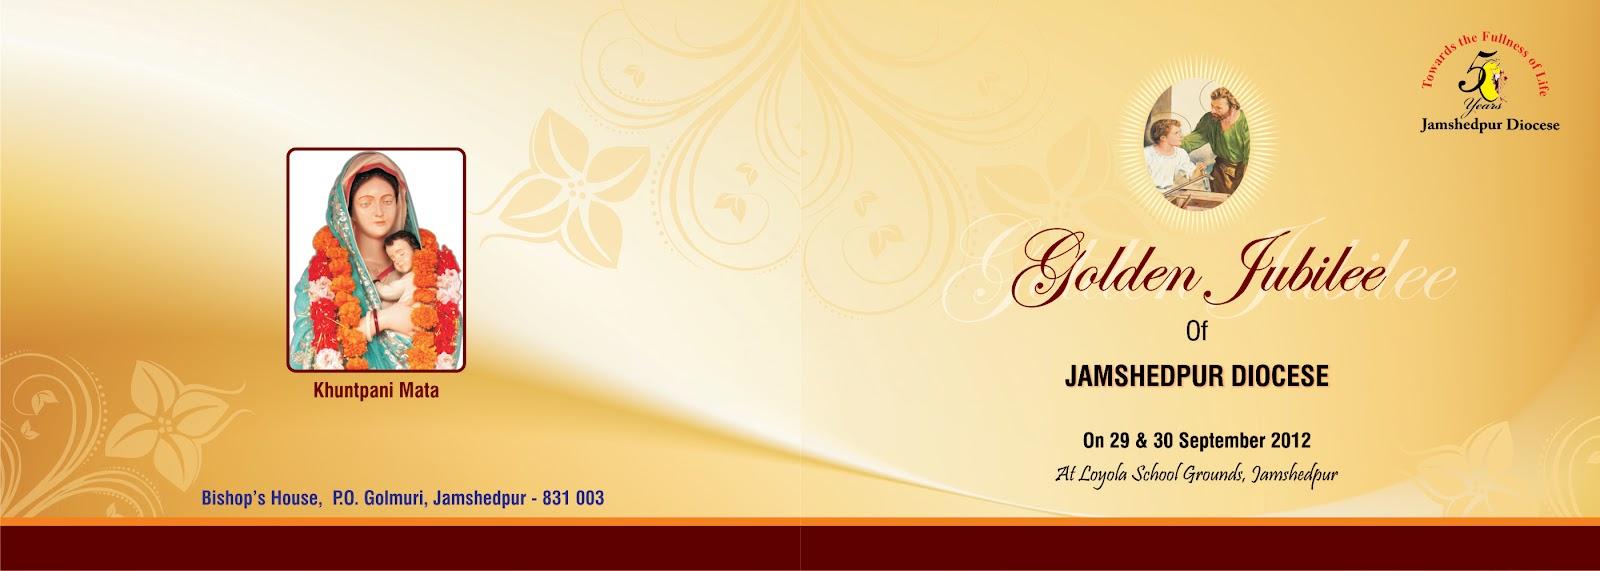 Jamshedpur diocese golden jubilee 1962 2012 yesu krist mahotsav kristyandbryce Choice Image